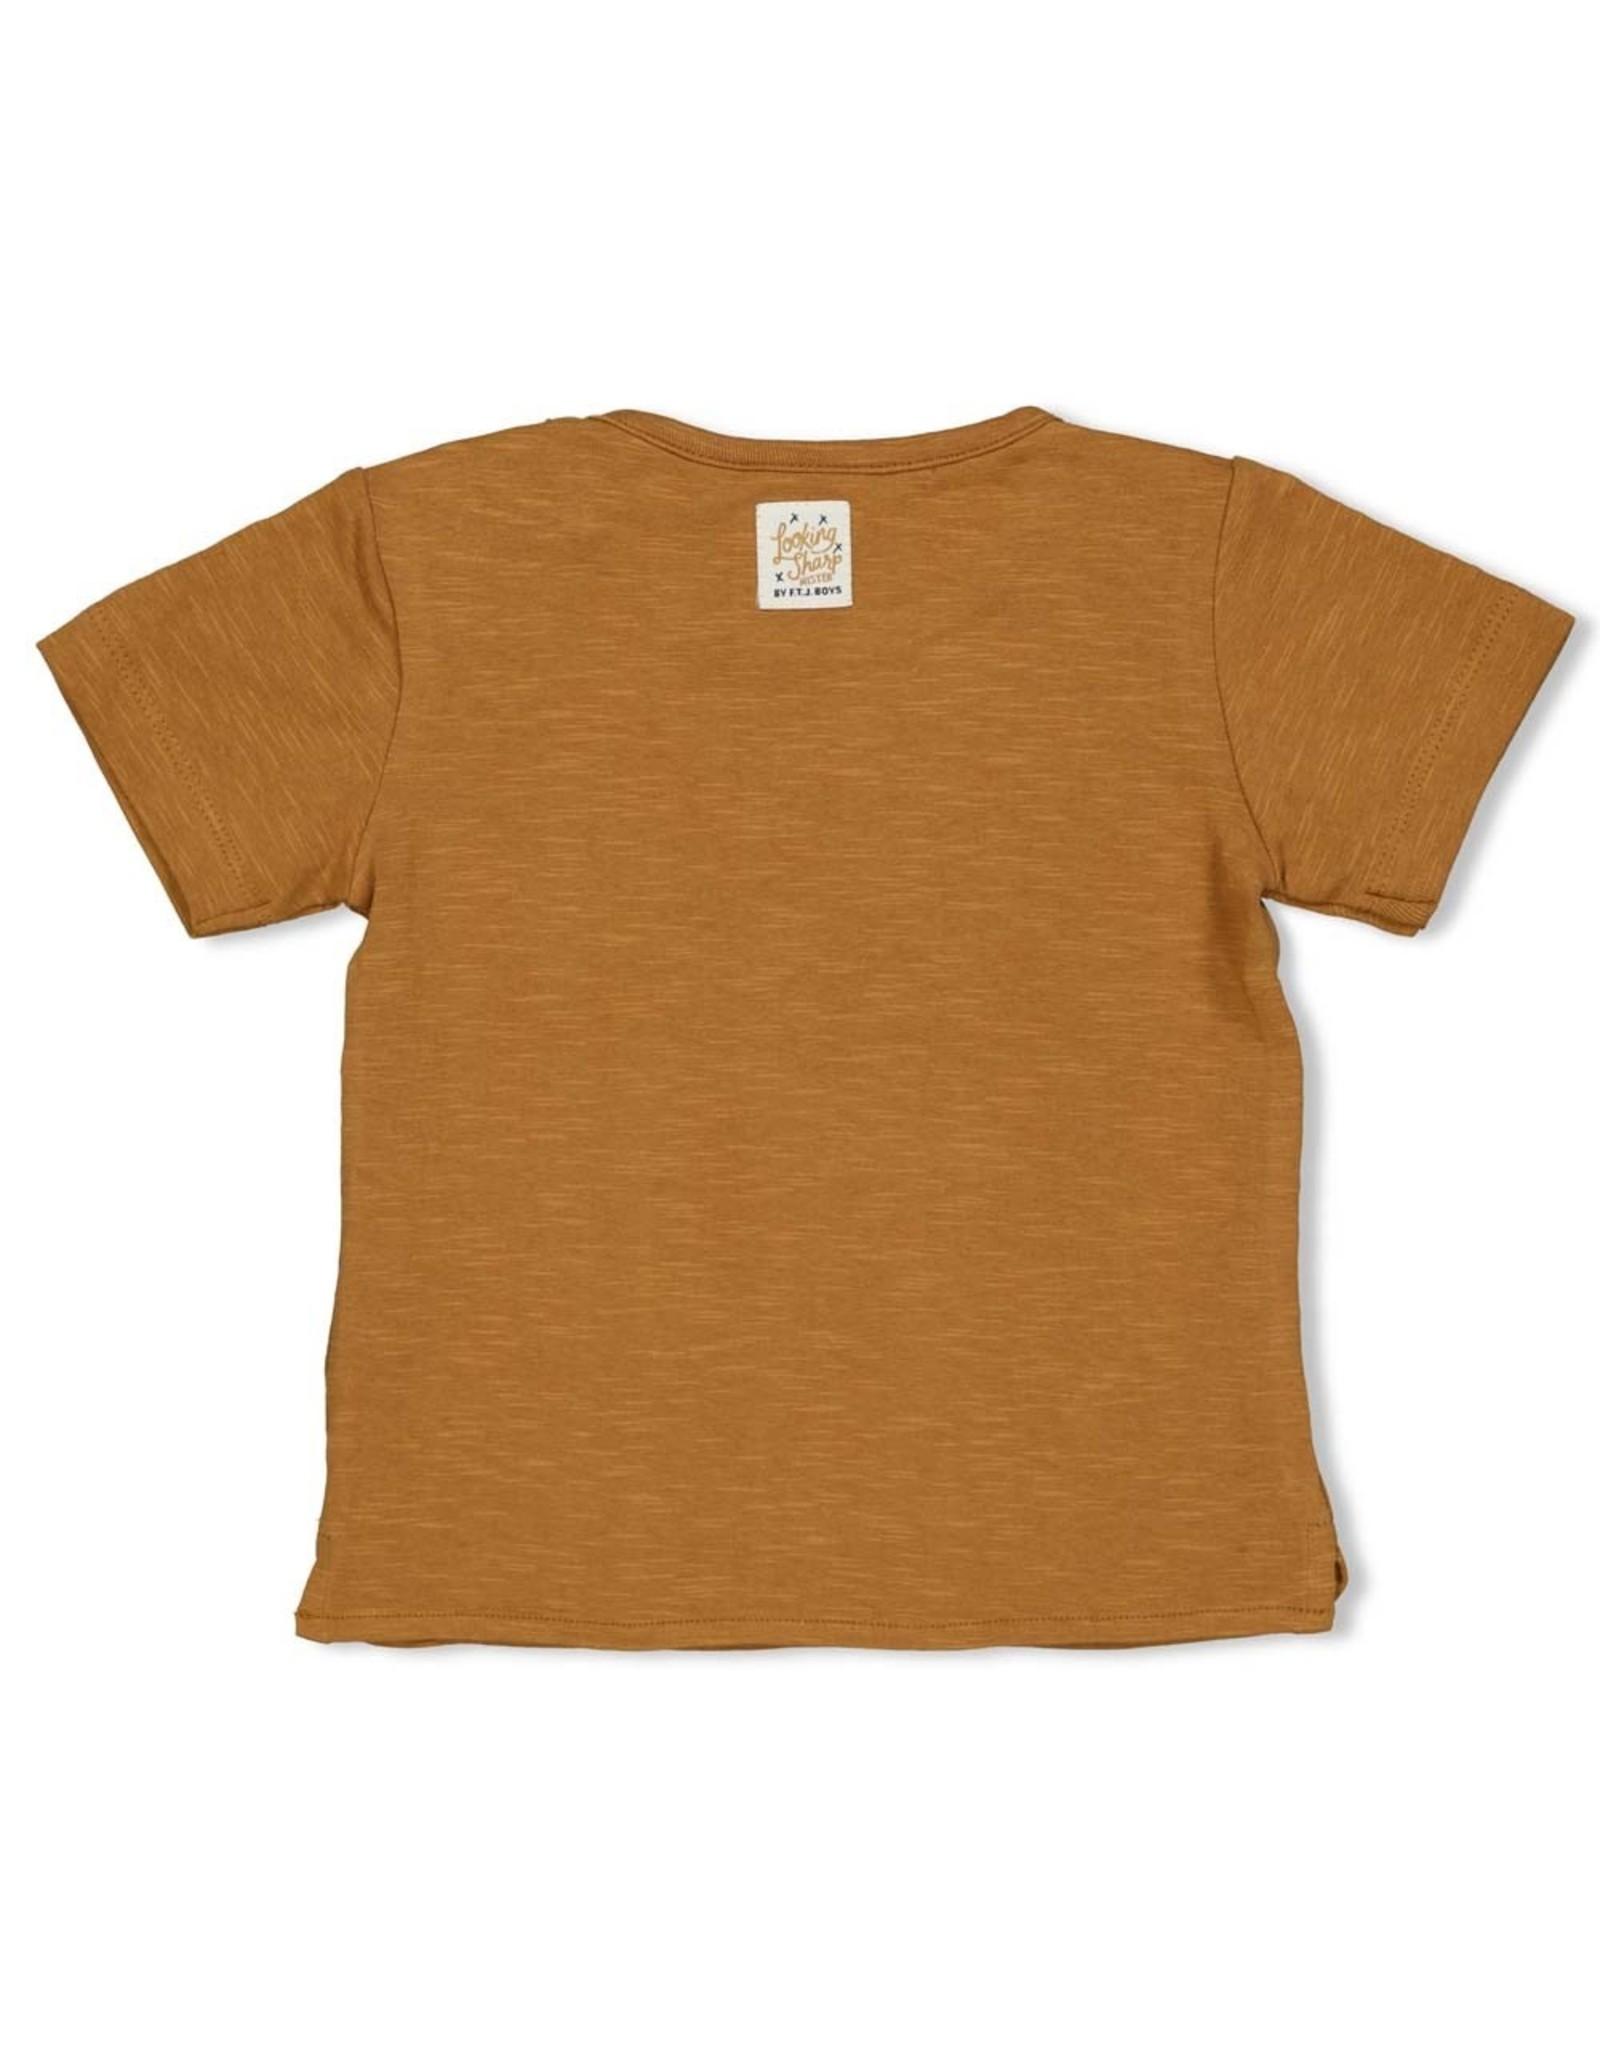 Feetje T-shirt Chill On - Looking Sharp. Camel